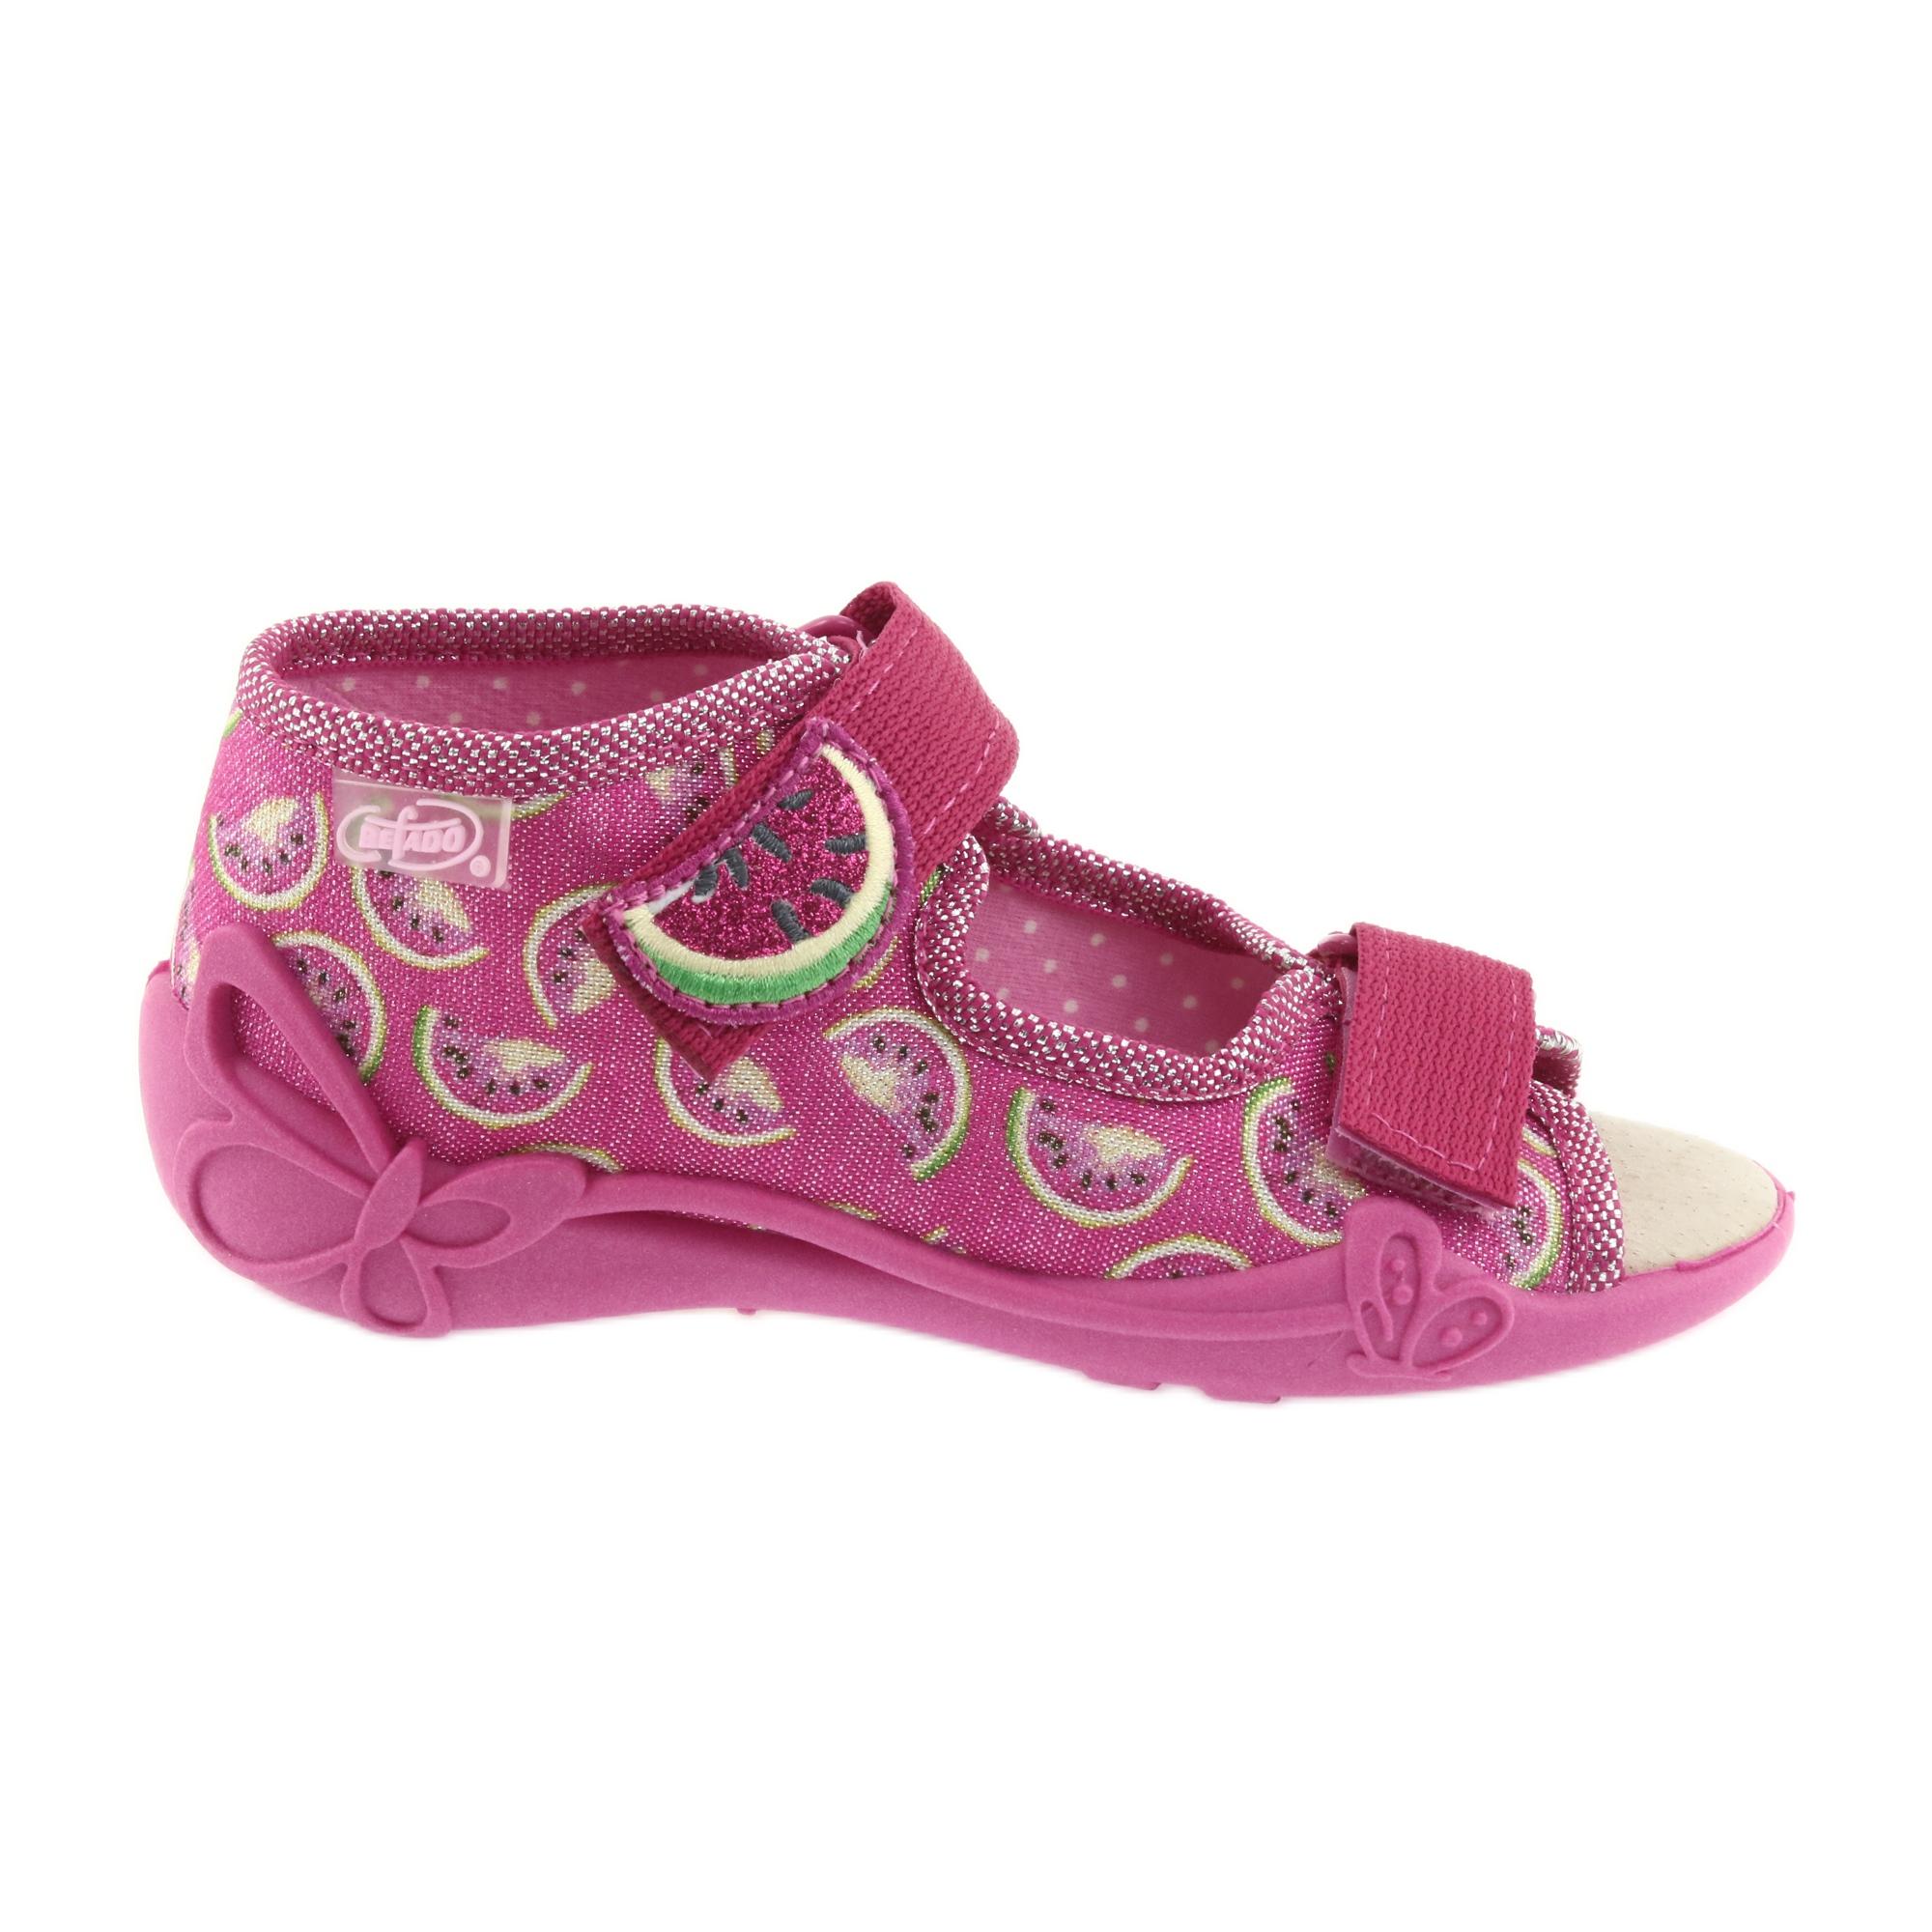 Sandali Befado scarpe da bambino 342P004 angurie grigio verde giallo rosa